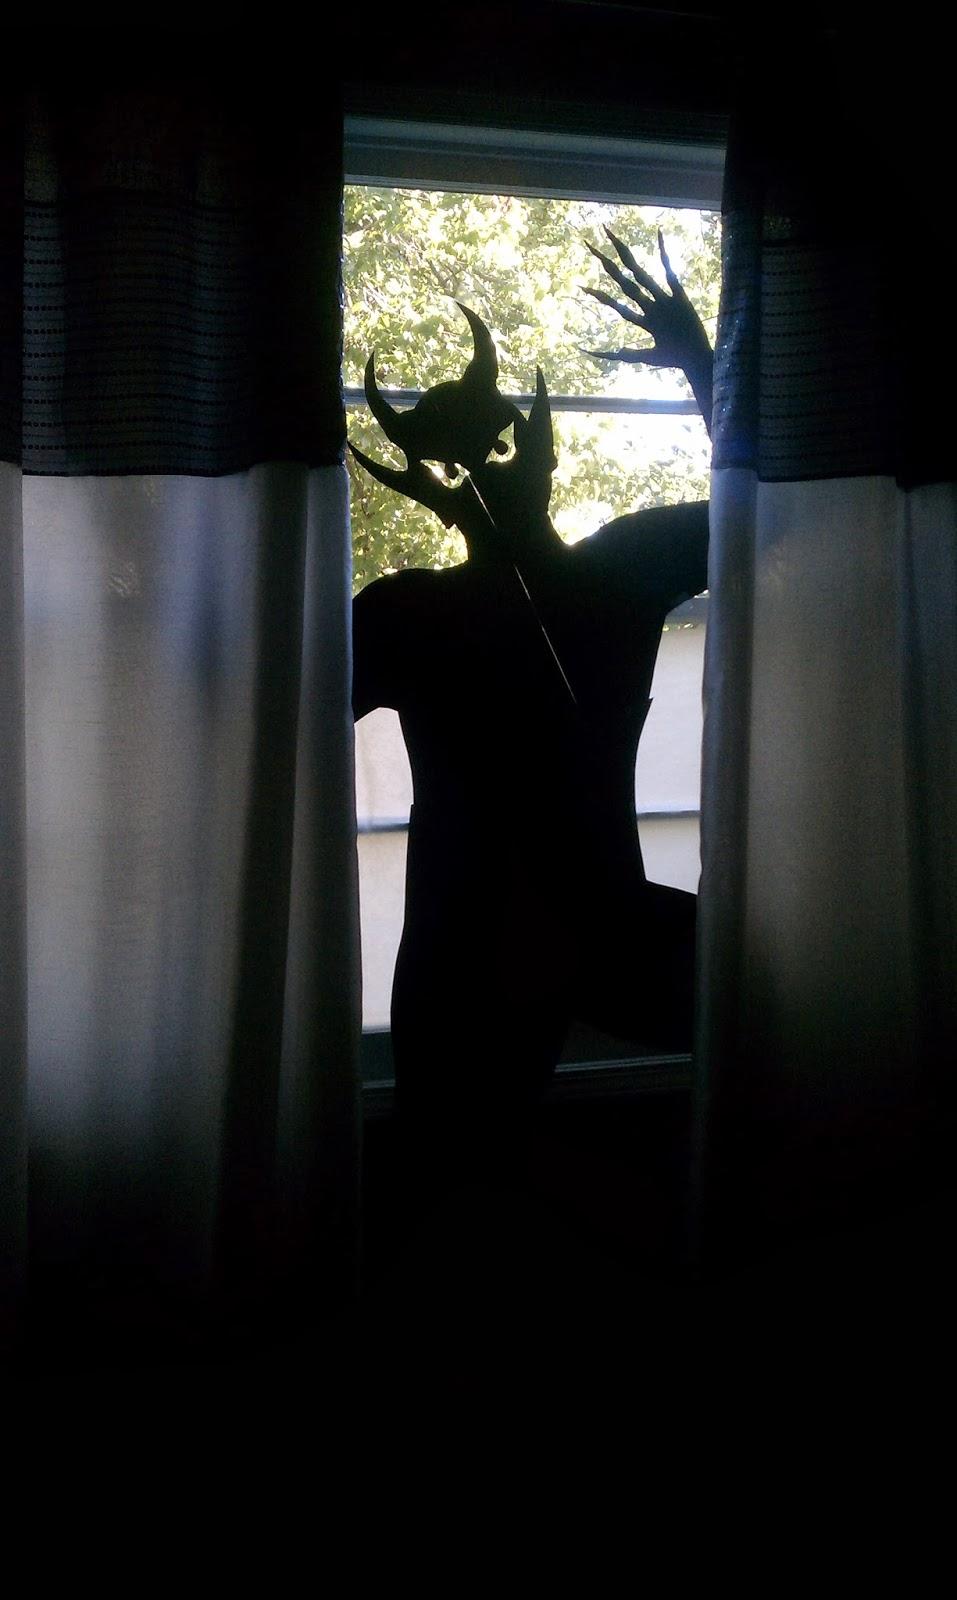 Nadia S Diy Projects Diy Halloween Window Silhouettes